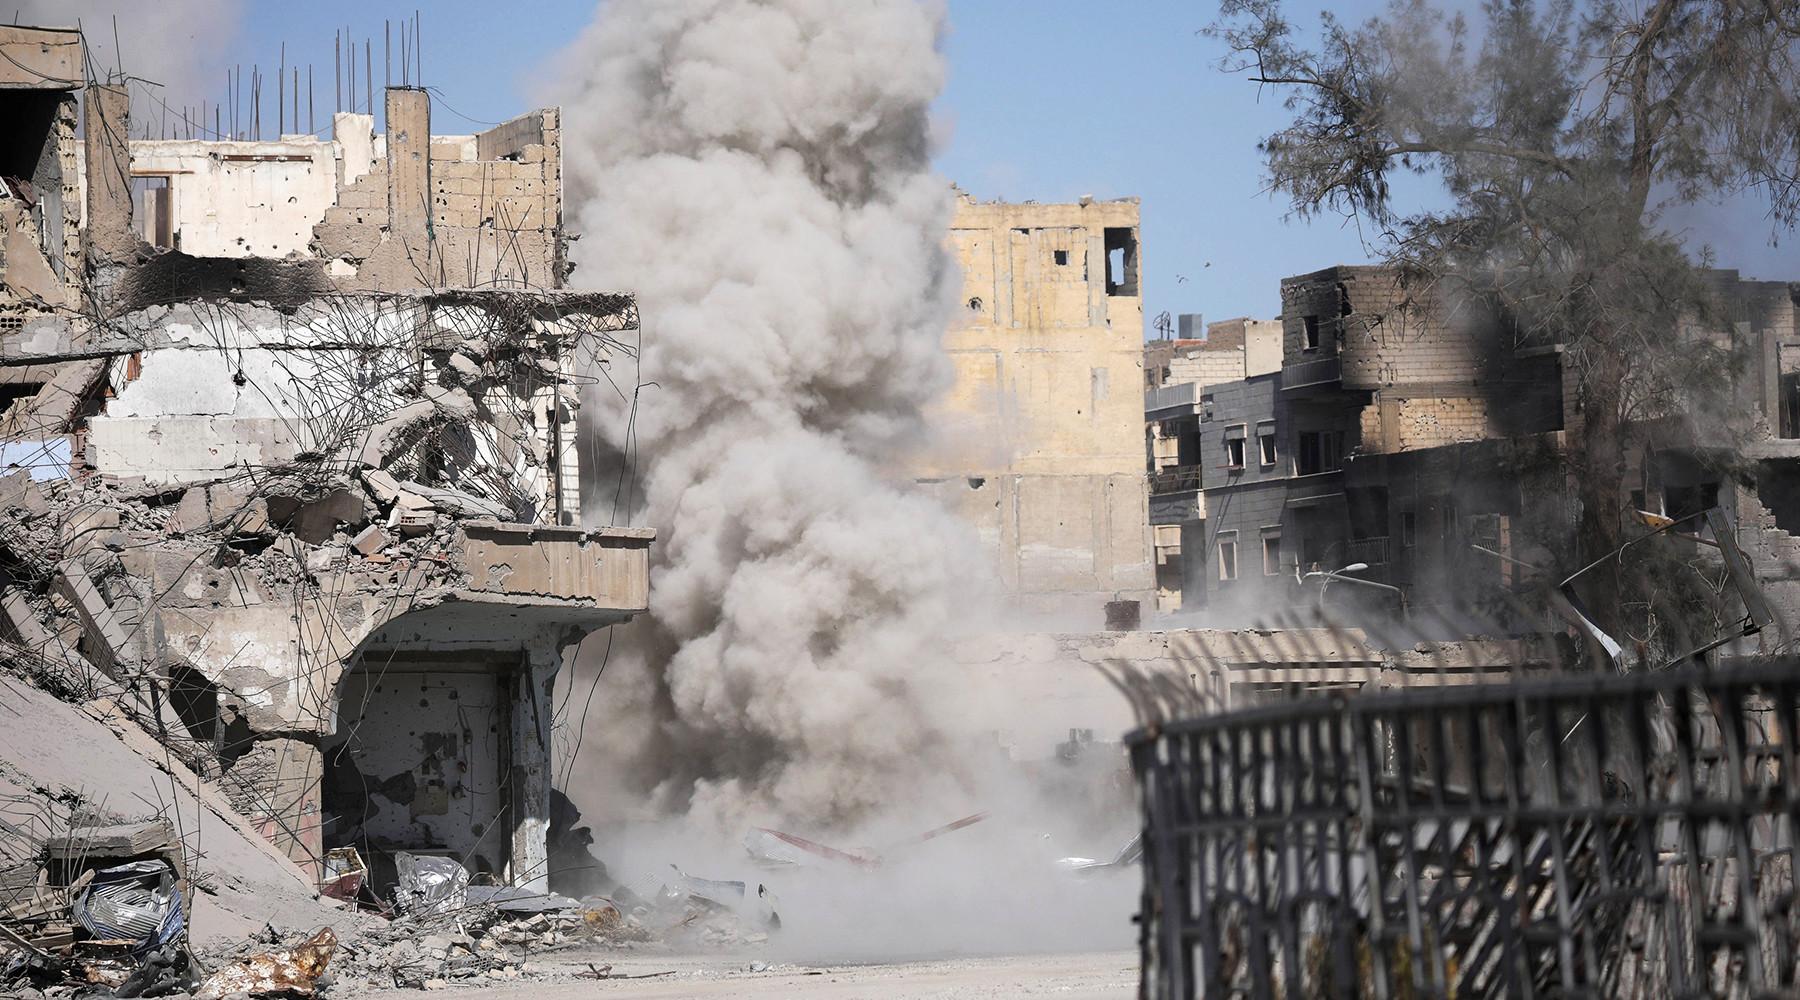 США бомбили сирийскую Ракку, как Дрезден в1945-м— МинобороныРФ